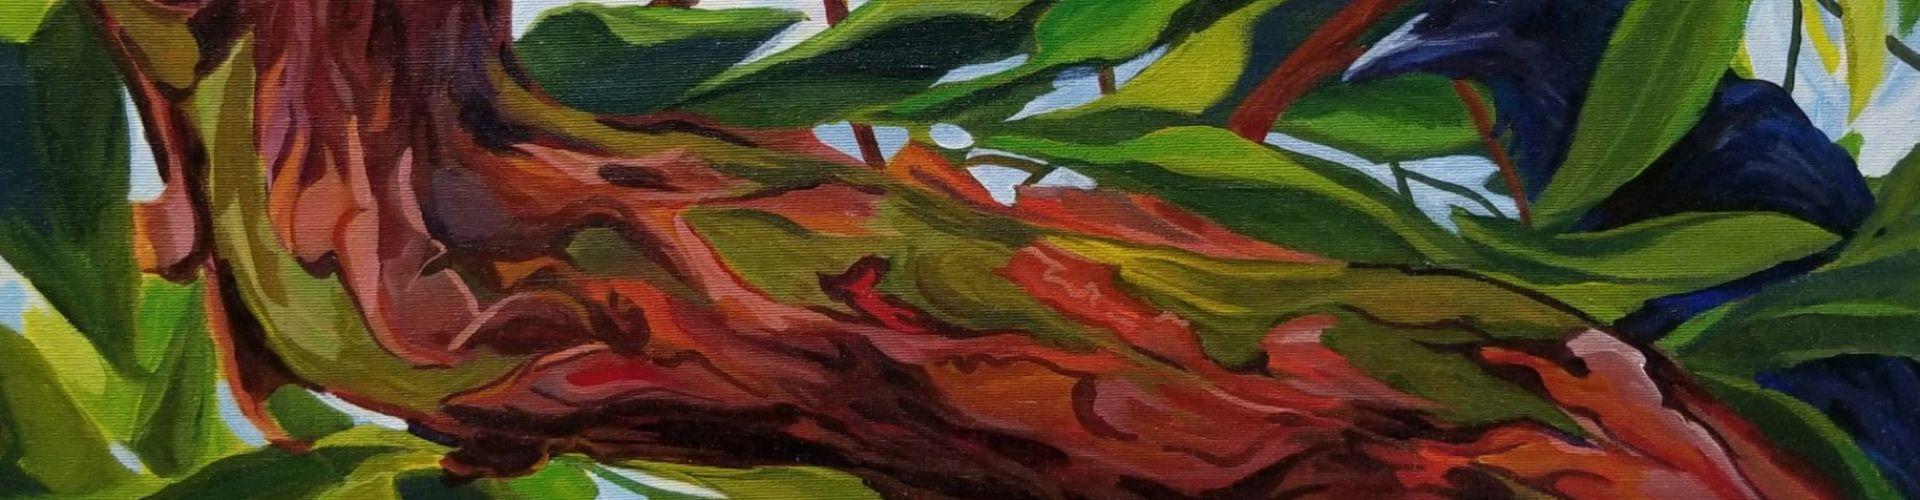 Visitor in the Arbutus Tree painting by Linda Lovisa